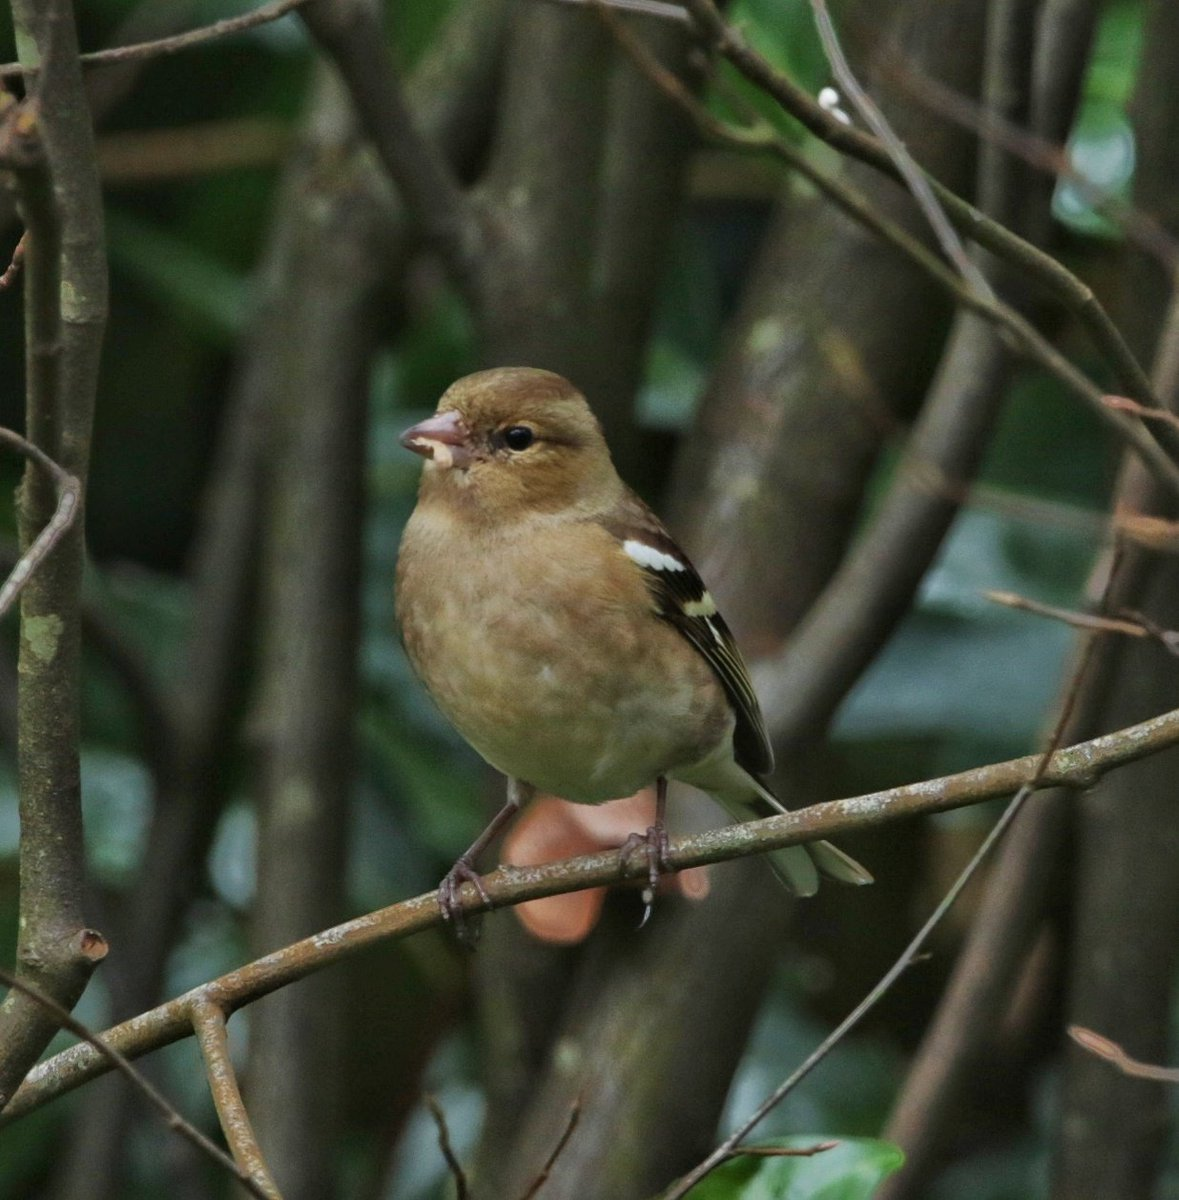 #februarivogelmaand Vink, female @vogelnieuws @Roots_NL @VroegeVogelspic.twitter.com/pwy44MvEGY